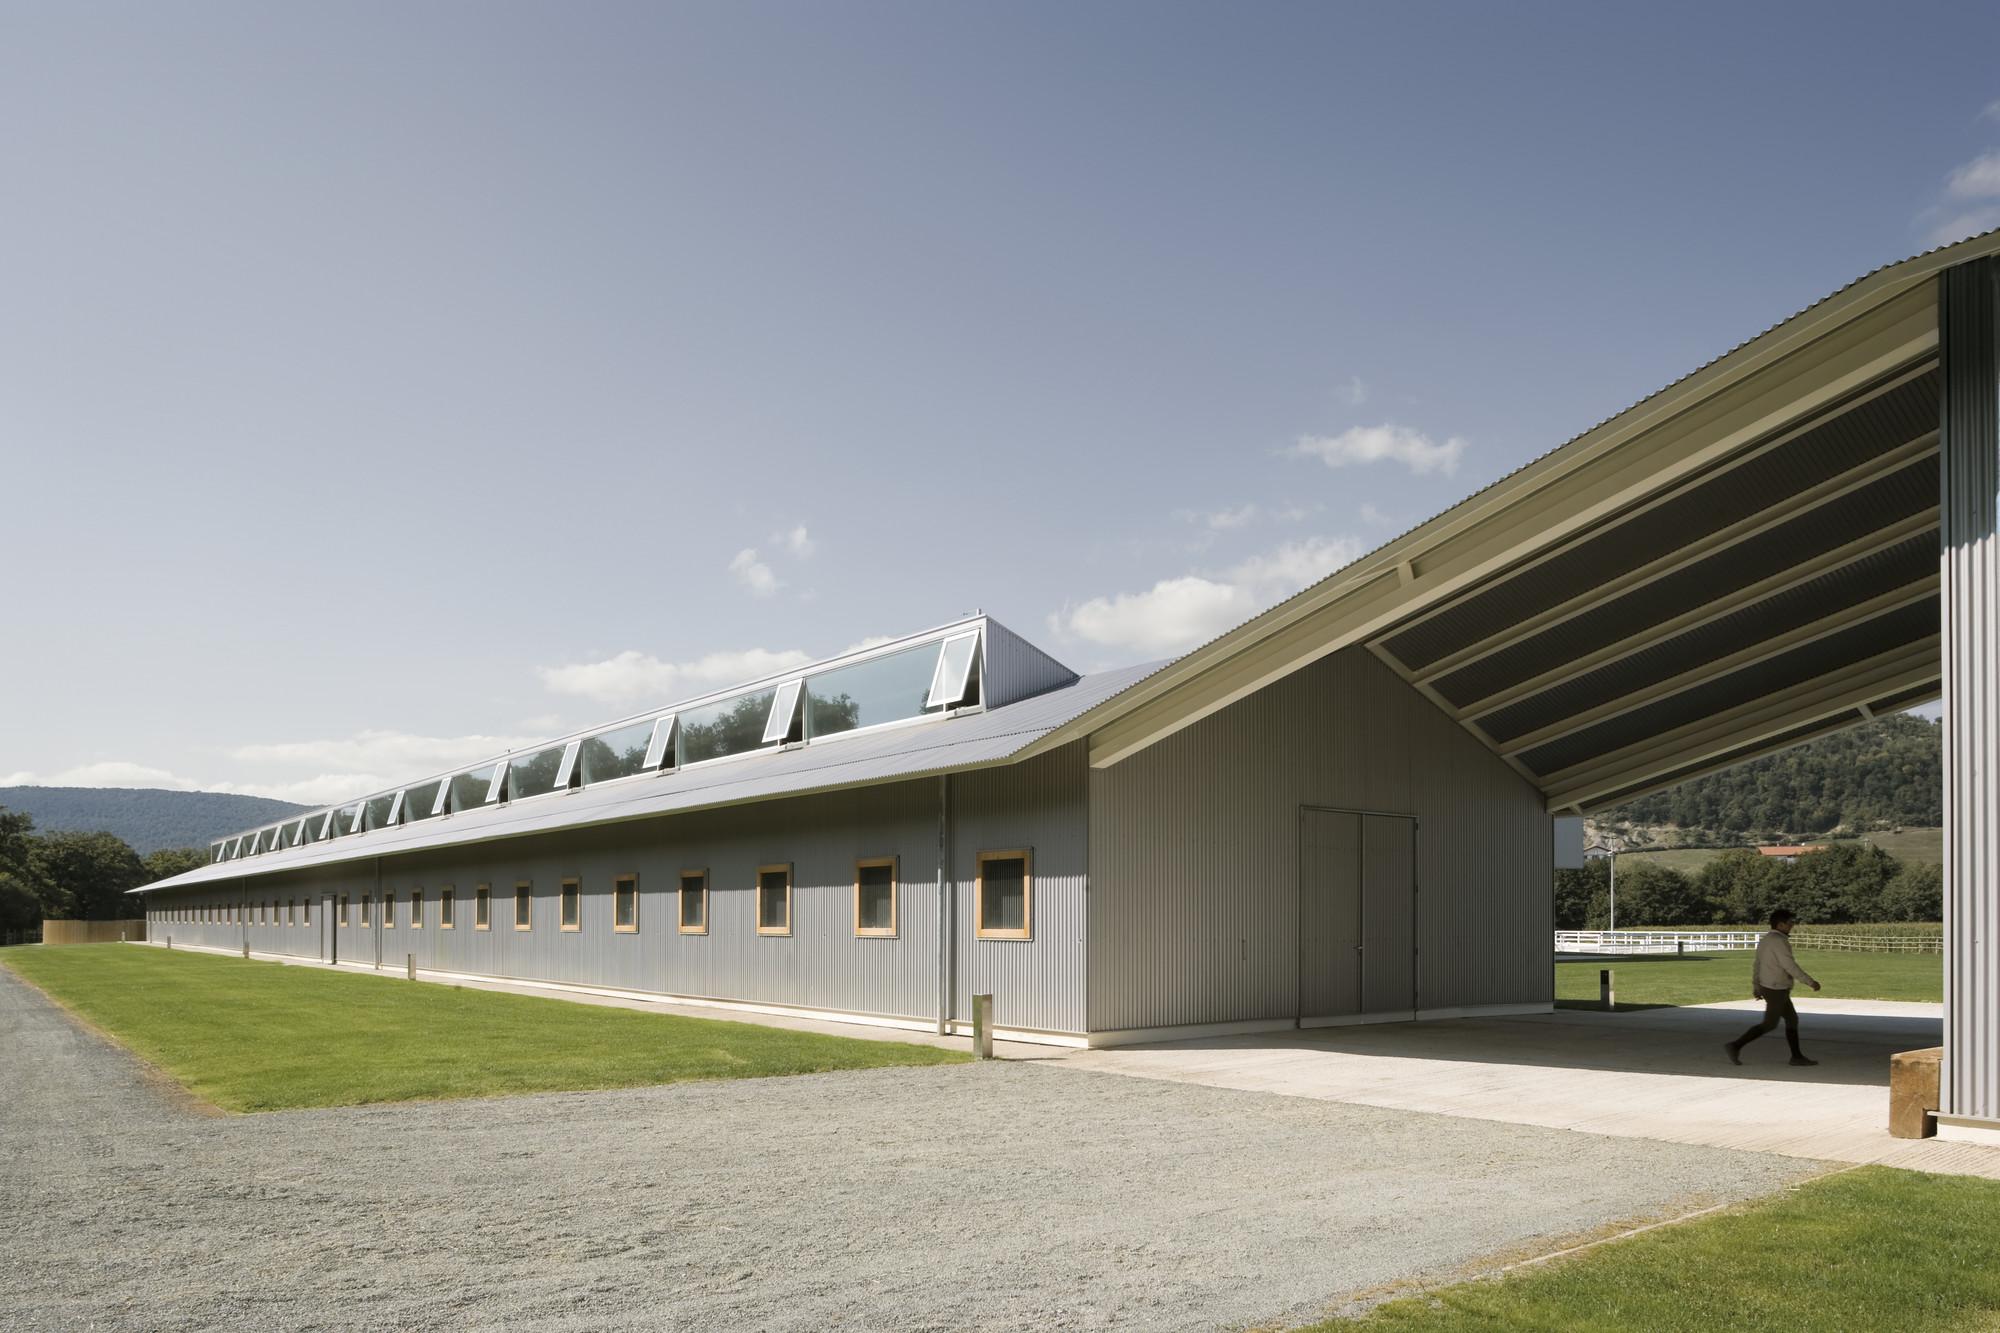 Gallery of Elite Equestrian Center / Francisco Mangado - 3